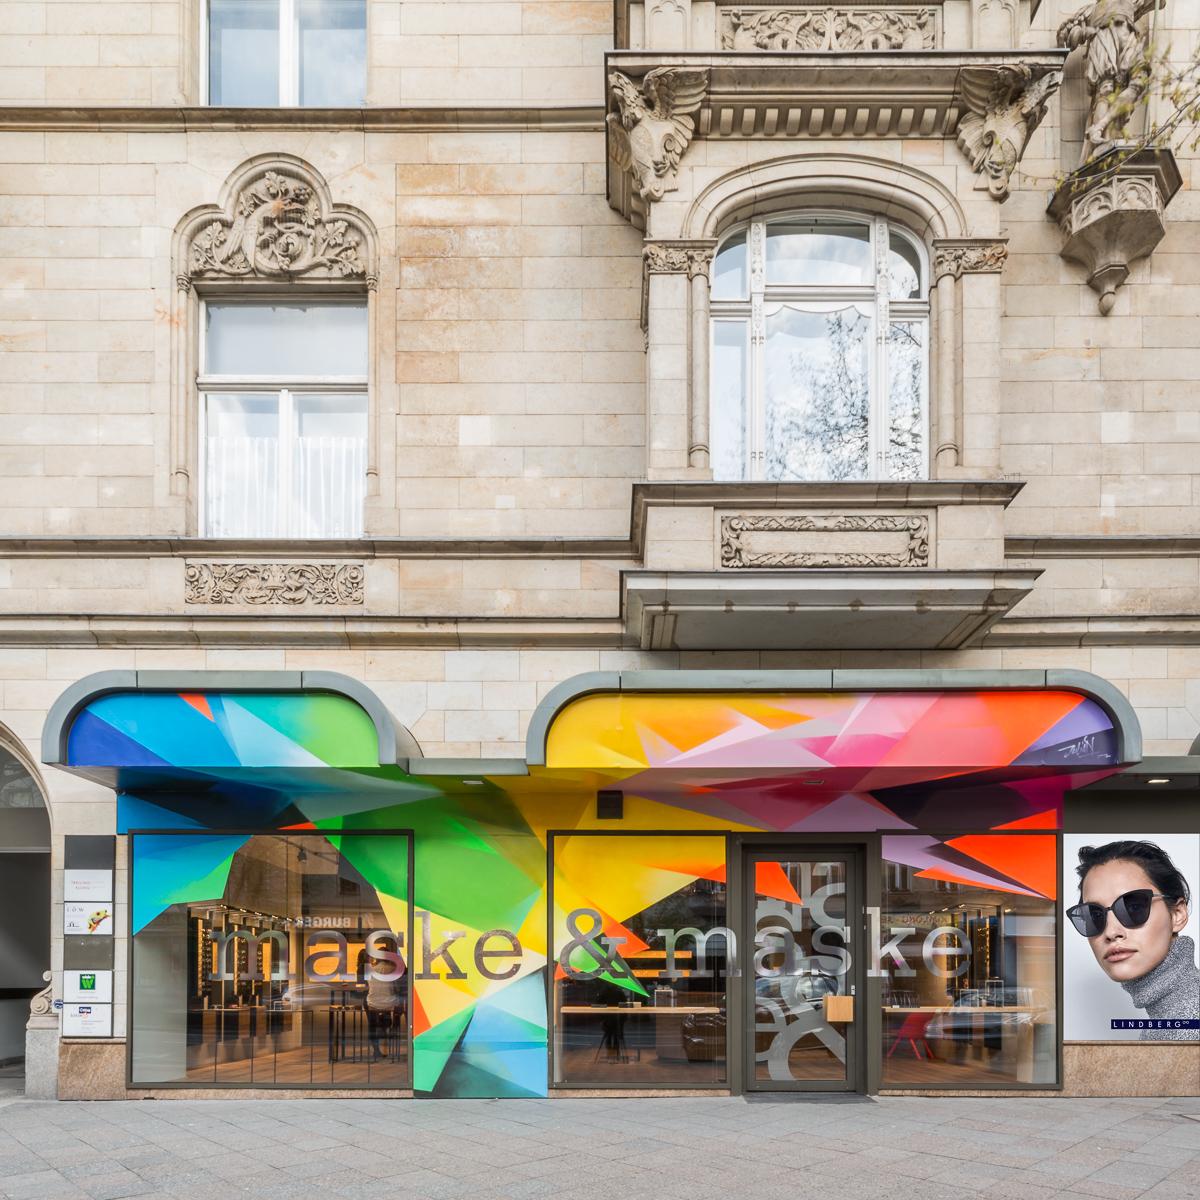 Maske & Maske Lindberg Monobrand Store Berlin